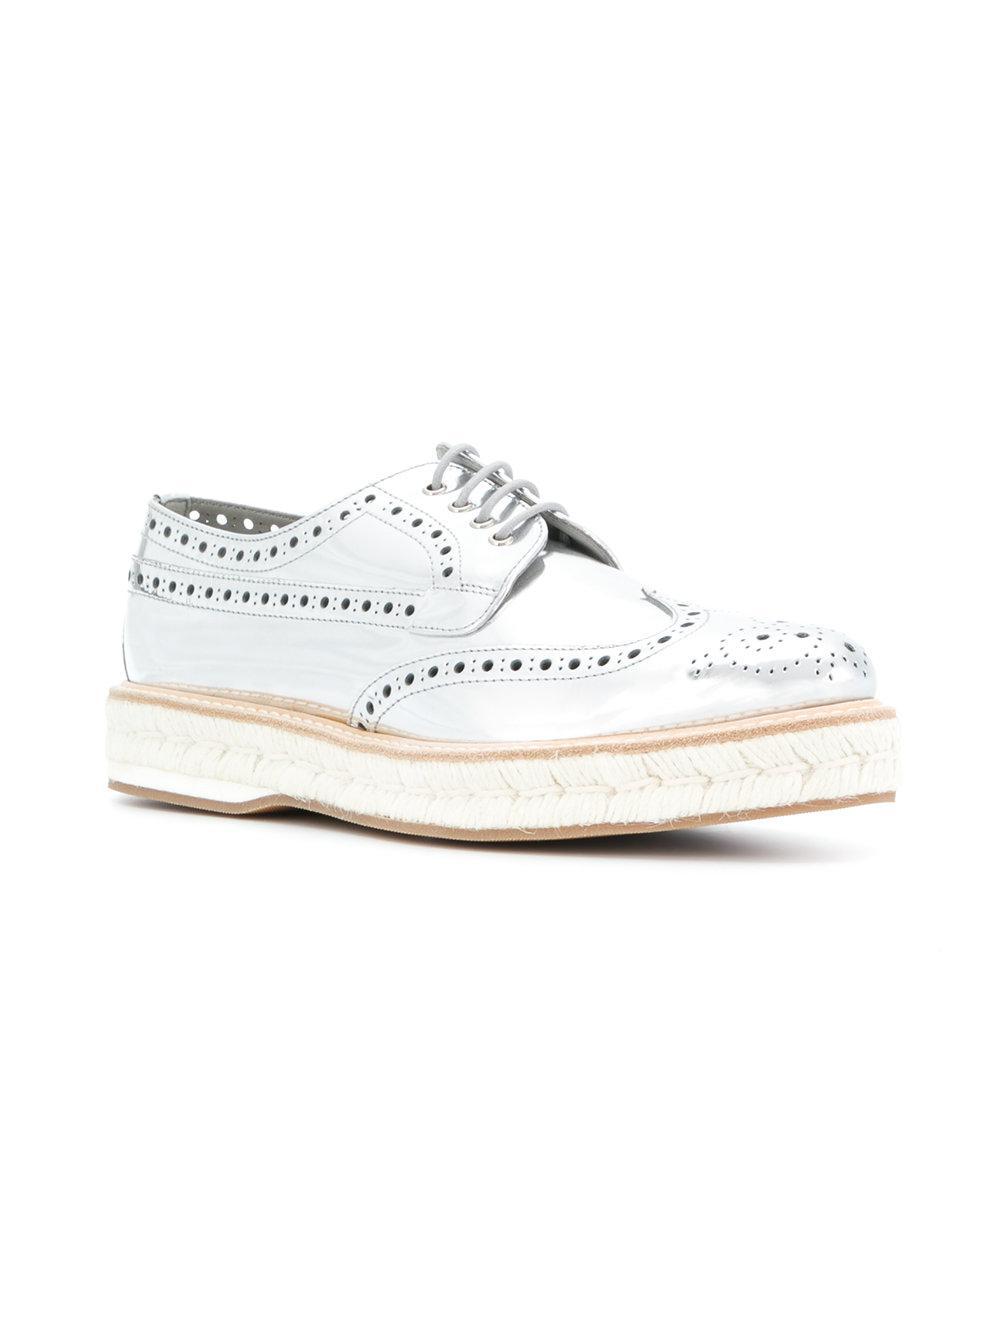 Chaussures Kelly Oxford De L'église - Métalliques JUf2imhL9